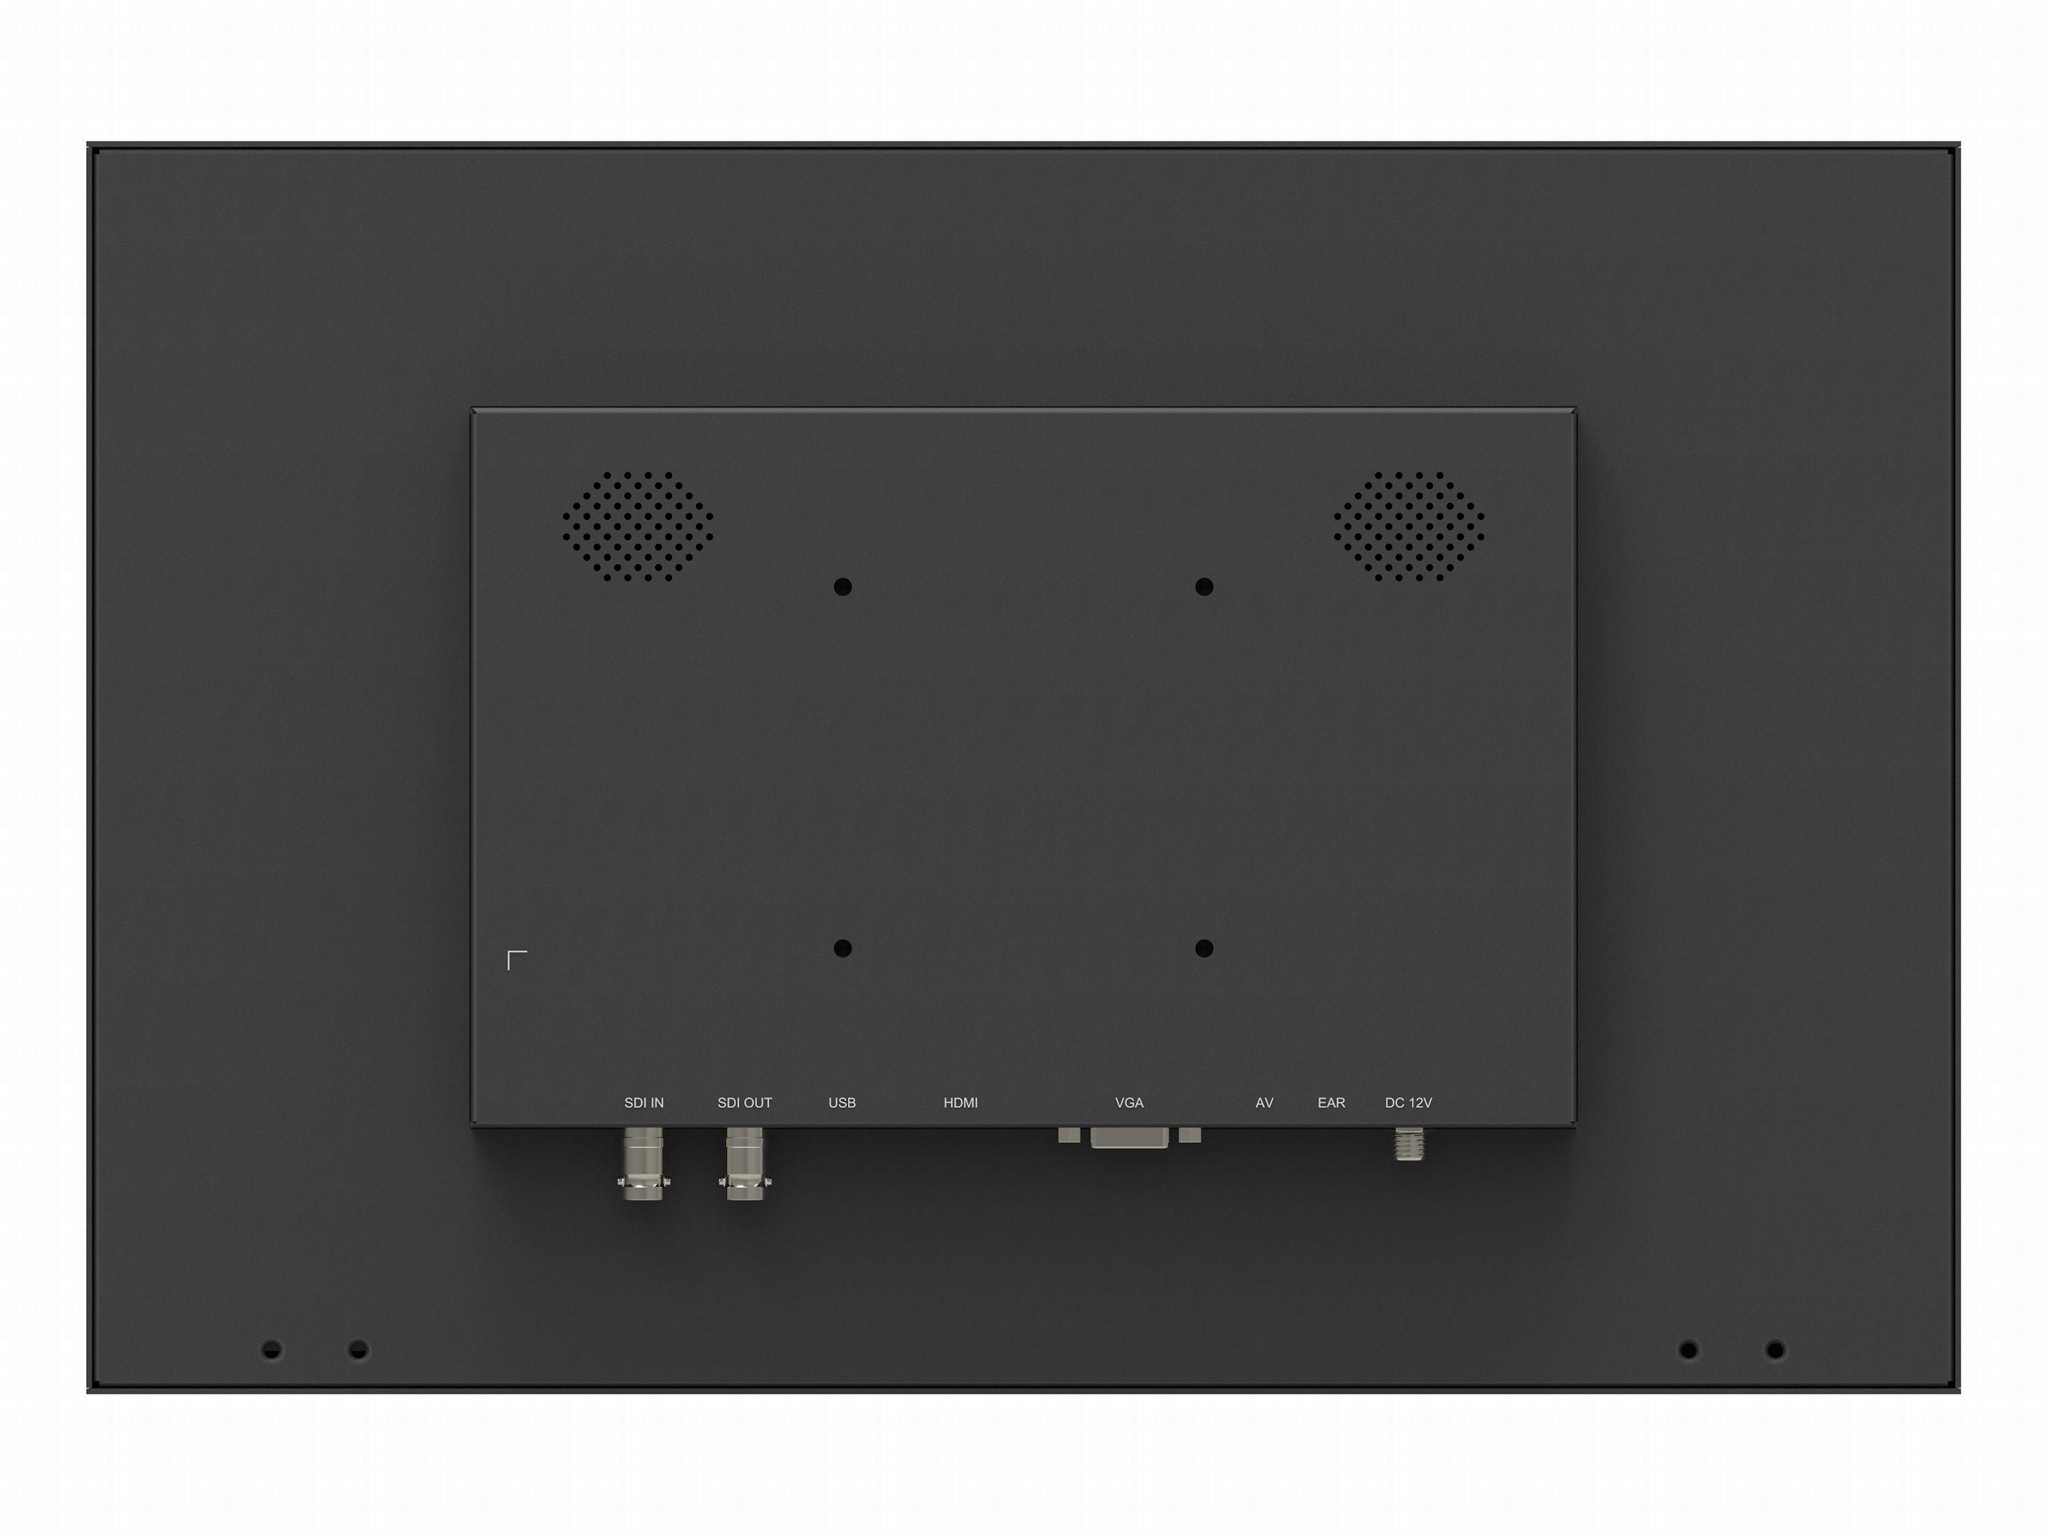 LILLIPUT 15.6 inch 1920*1080 security camera cctv monitor with 3G-SDI, HDMI, VGA 4